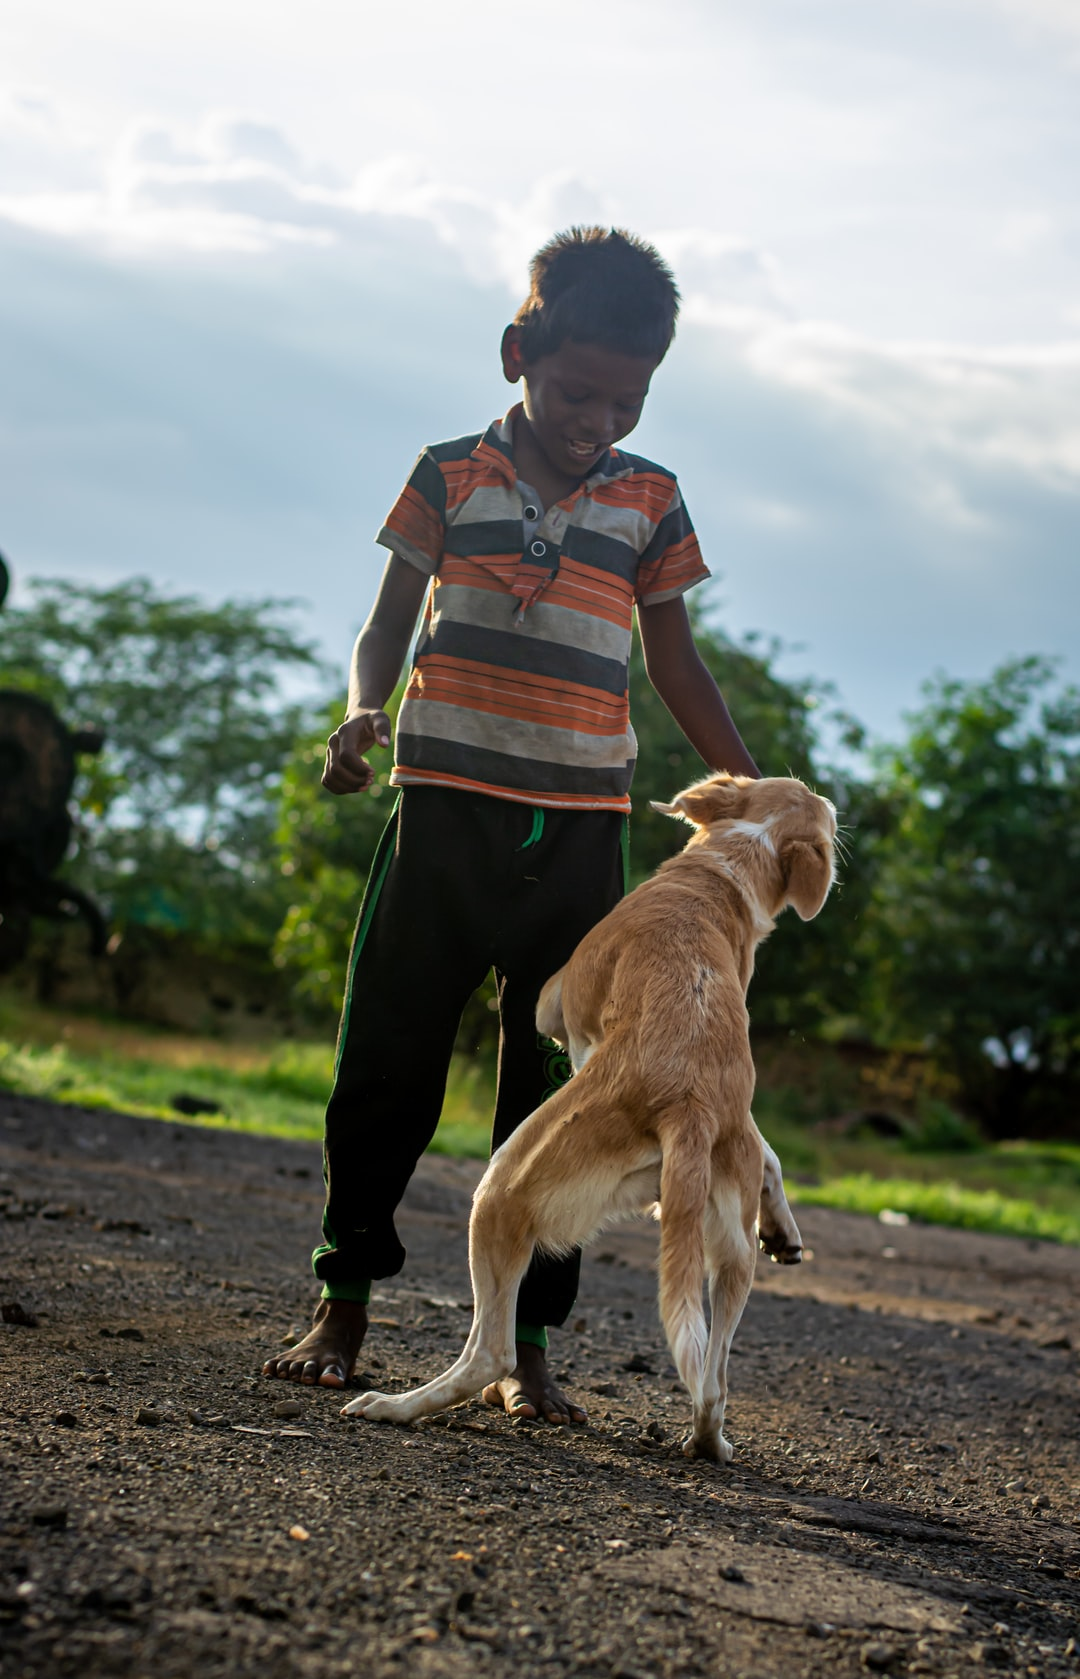 Life Sucks Sometimes | Gratitude, Dog Leashes, but No Dogs